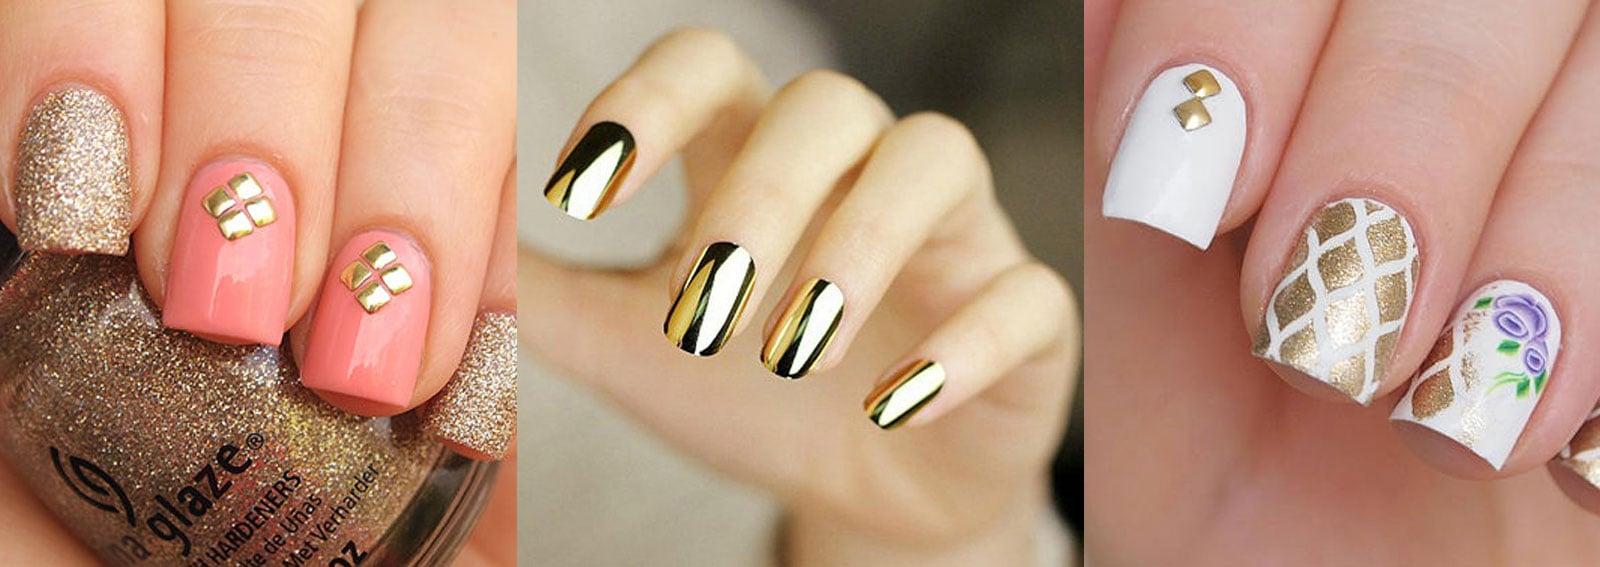 nail-art-gold-unghie-oro-estate-2018-COVER-DEKSTOP